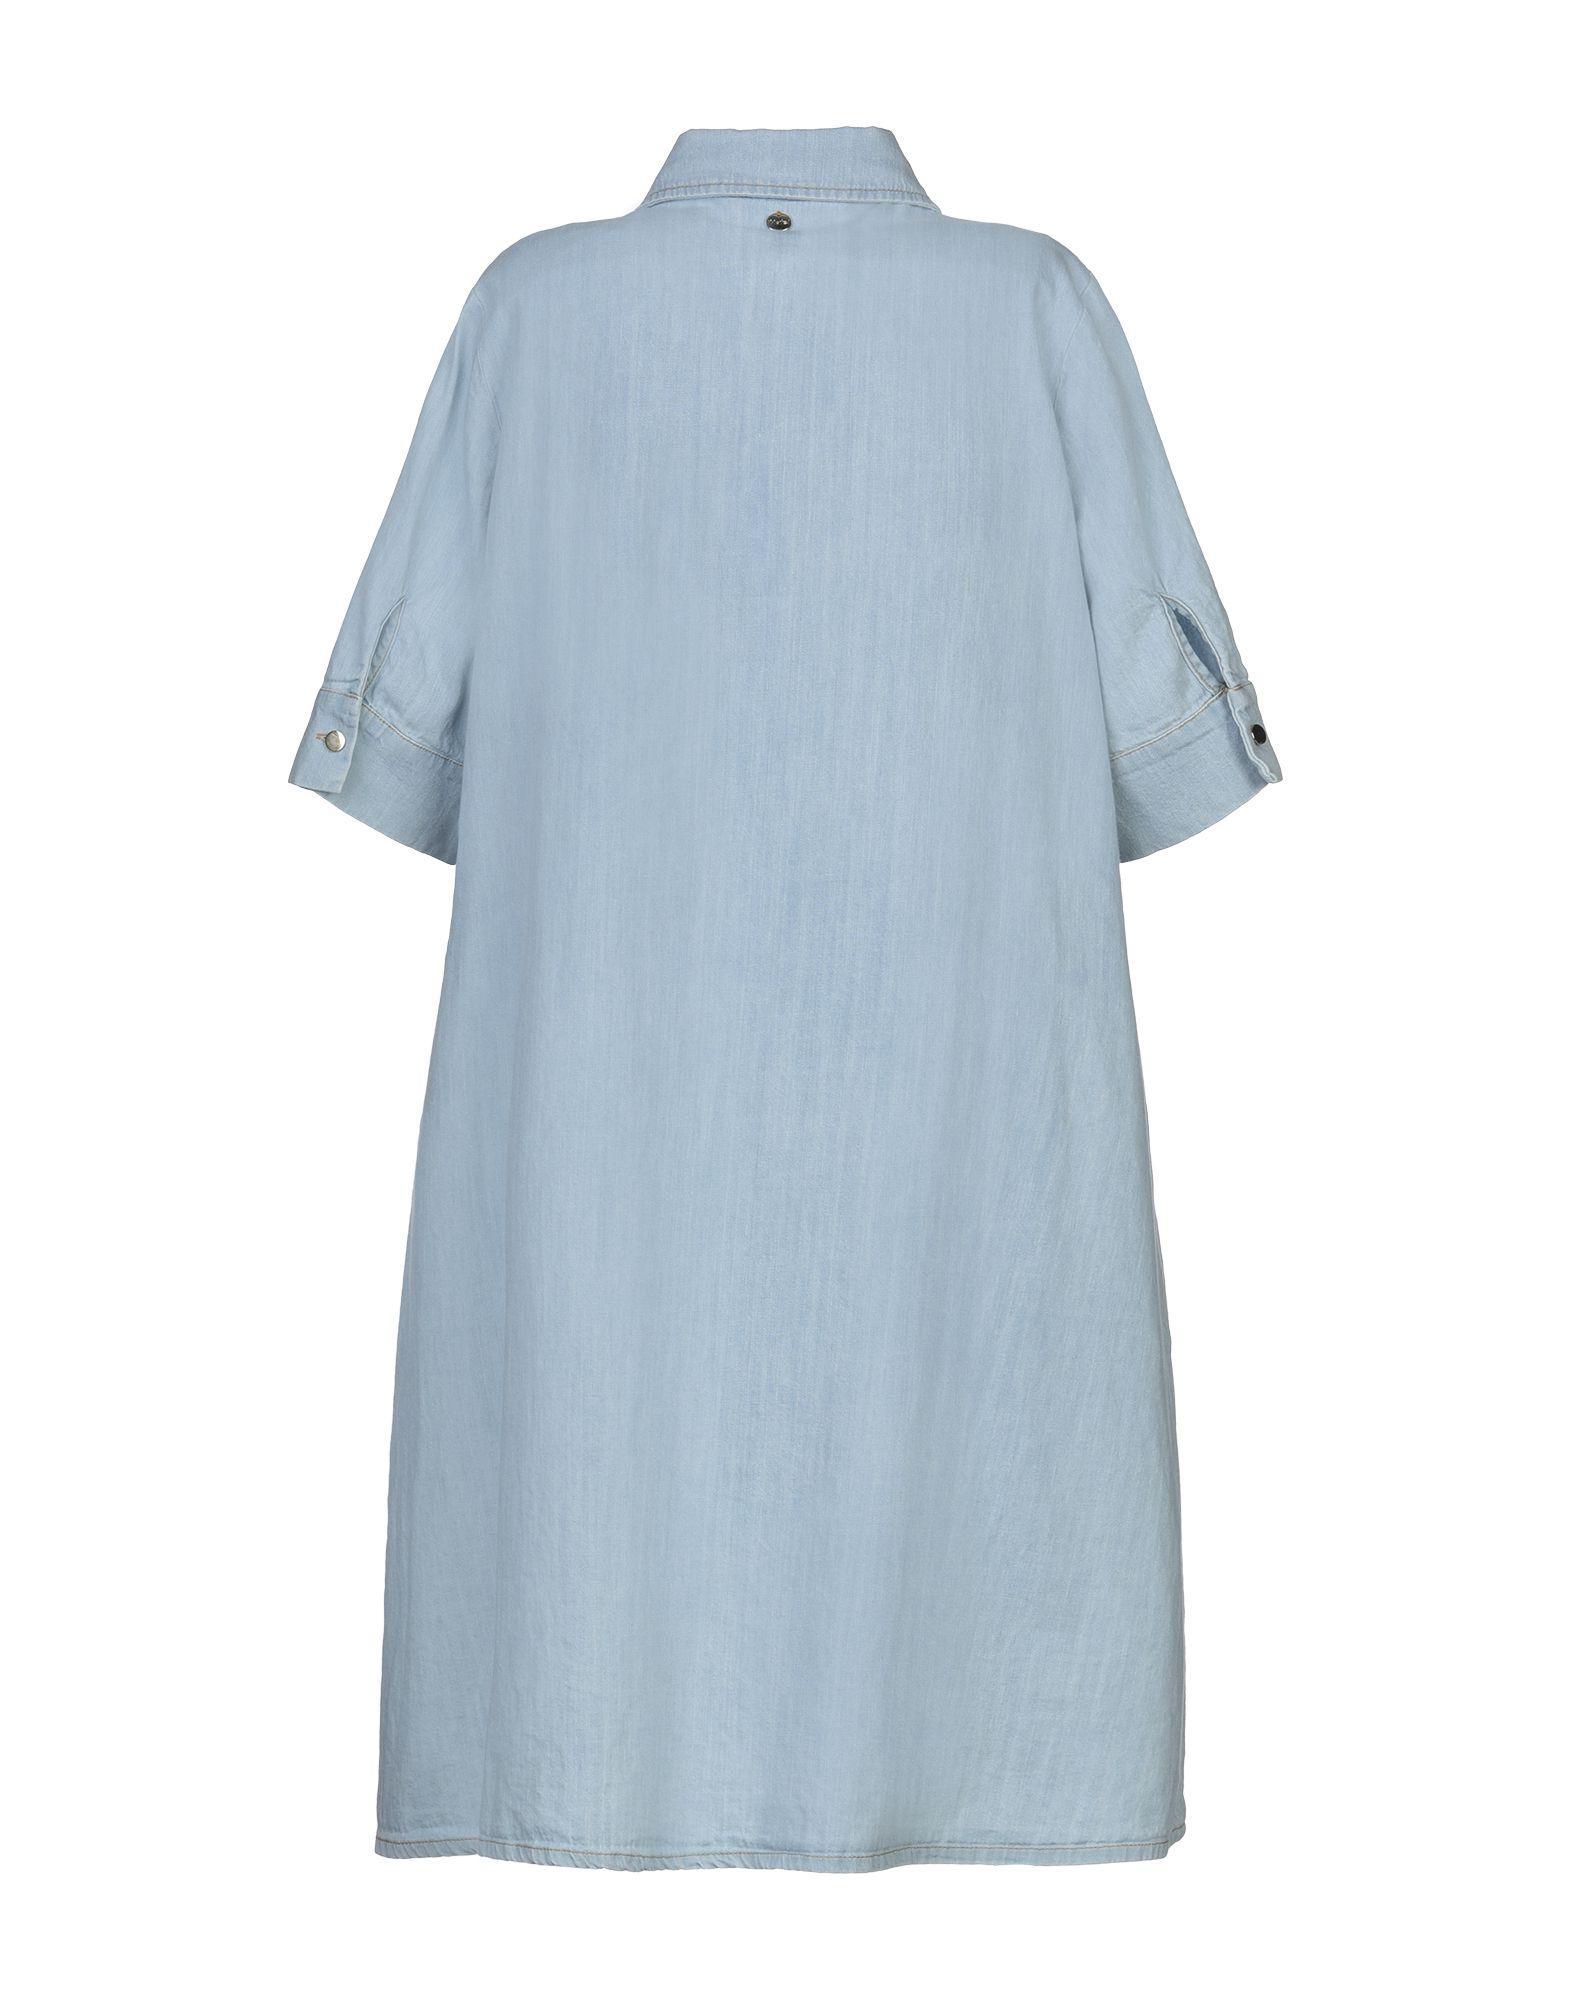 Motel Denim Kurzes Kleid in Blau